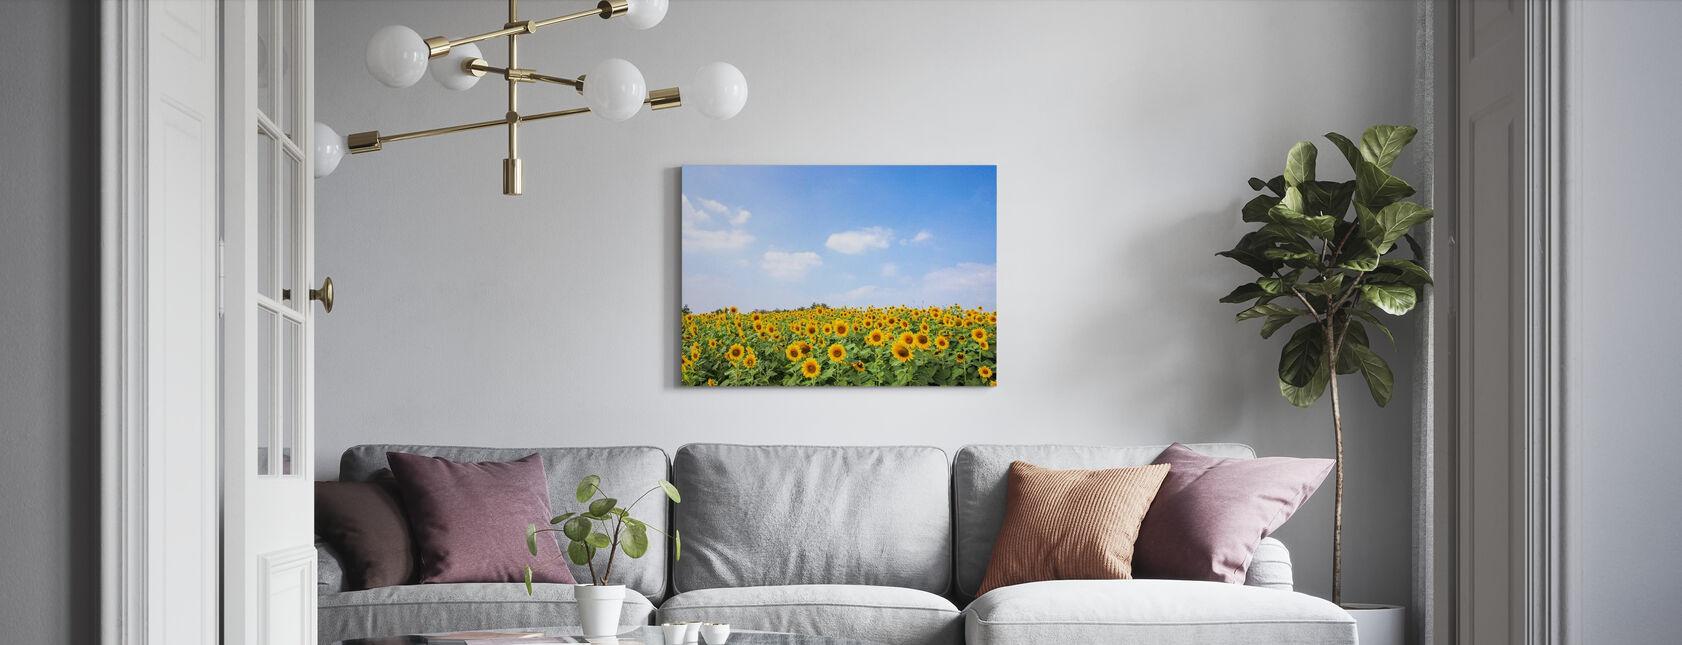 Pehmeät auringonkukat - Canvastaulu - Olohuone